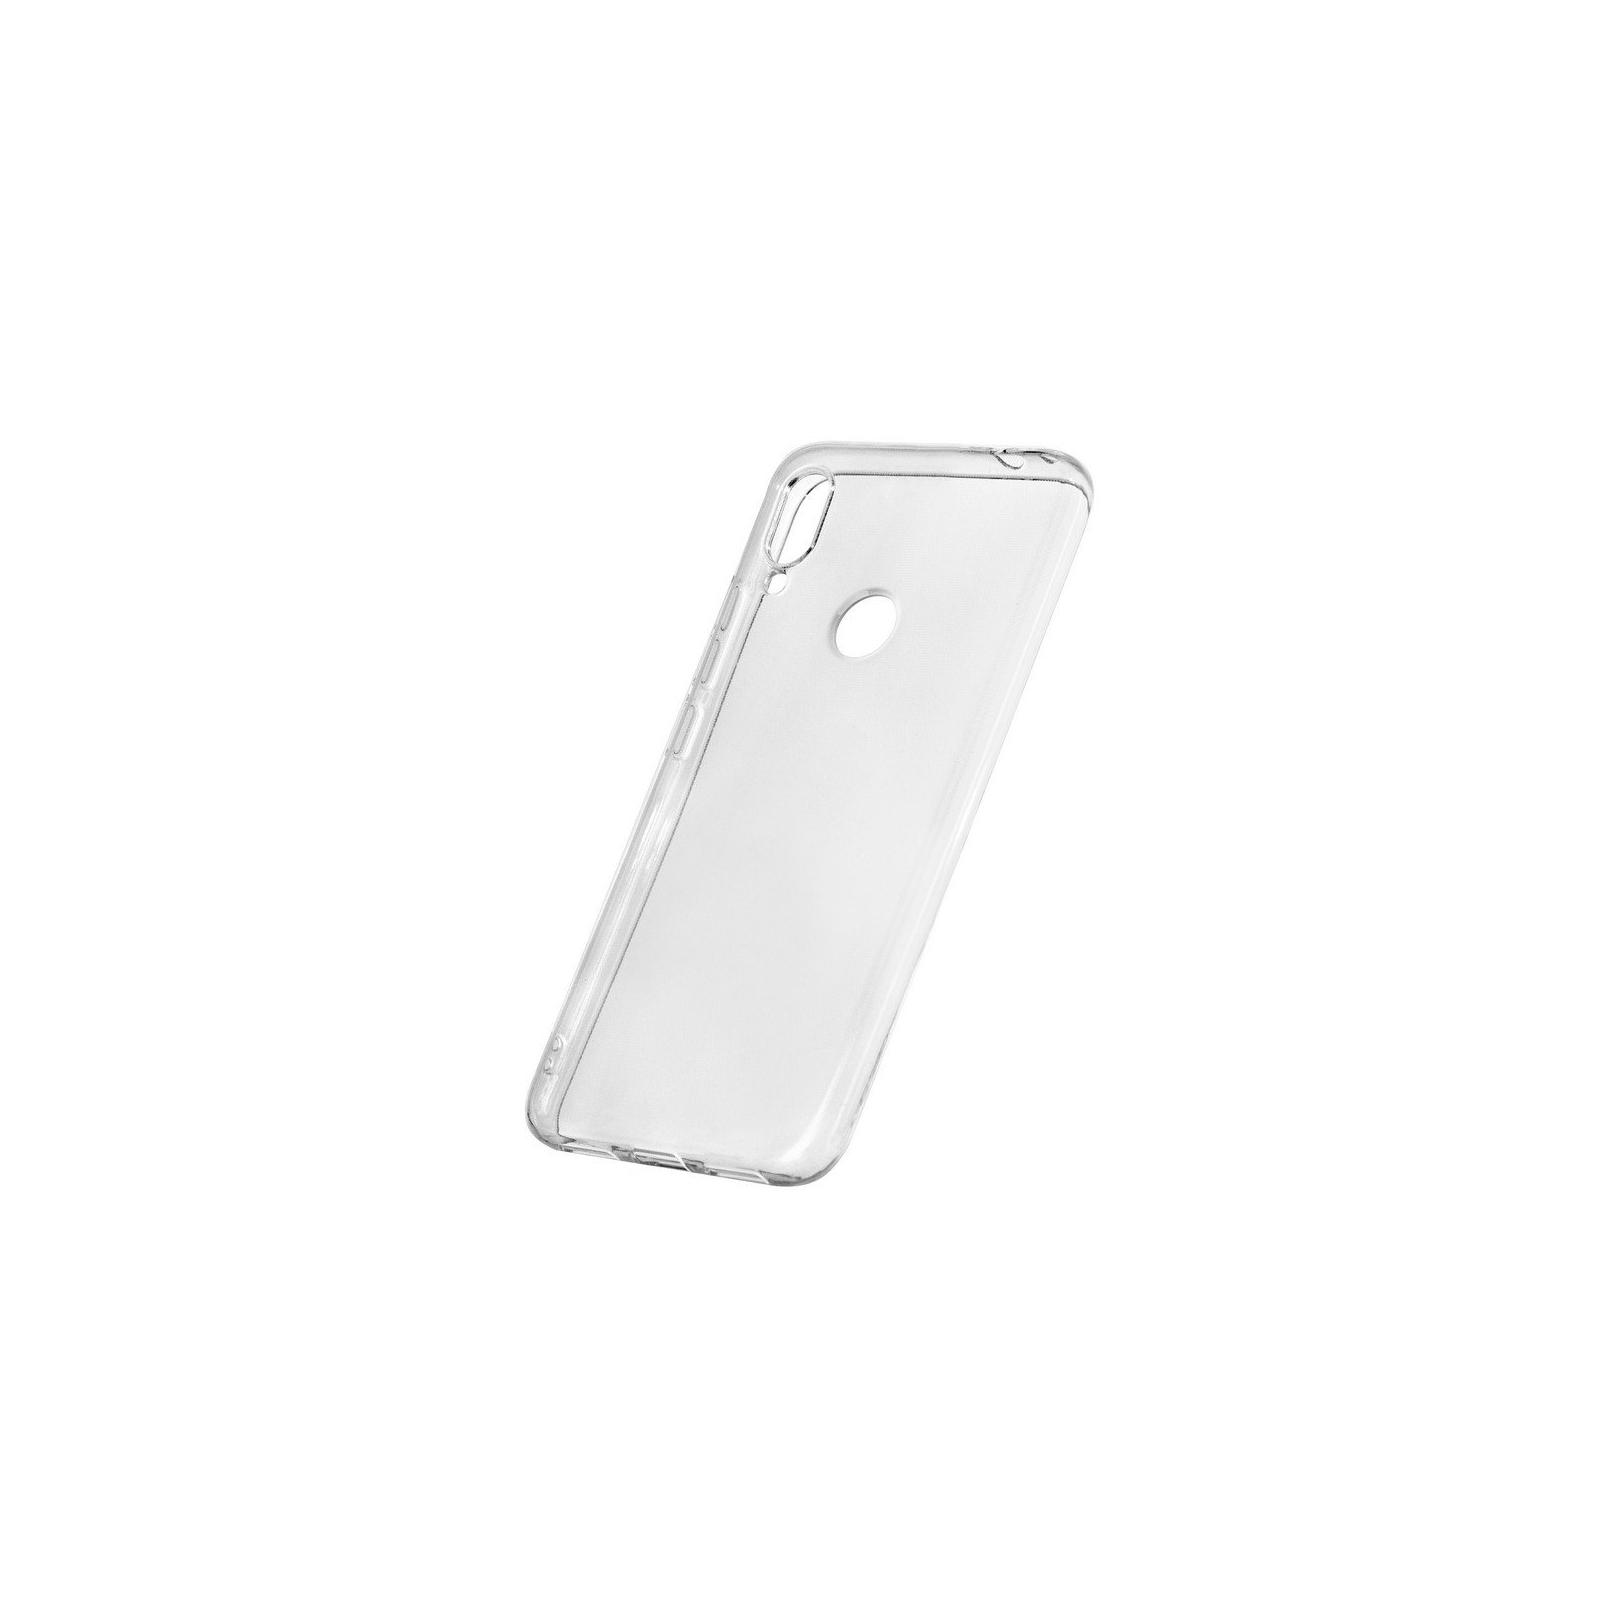 Чехол для моб. телефона ColorWay ColorWay TPU case for Xiaomi Redmi Note 7 (CW-CTBXRN7) изображение 2